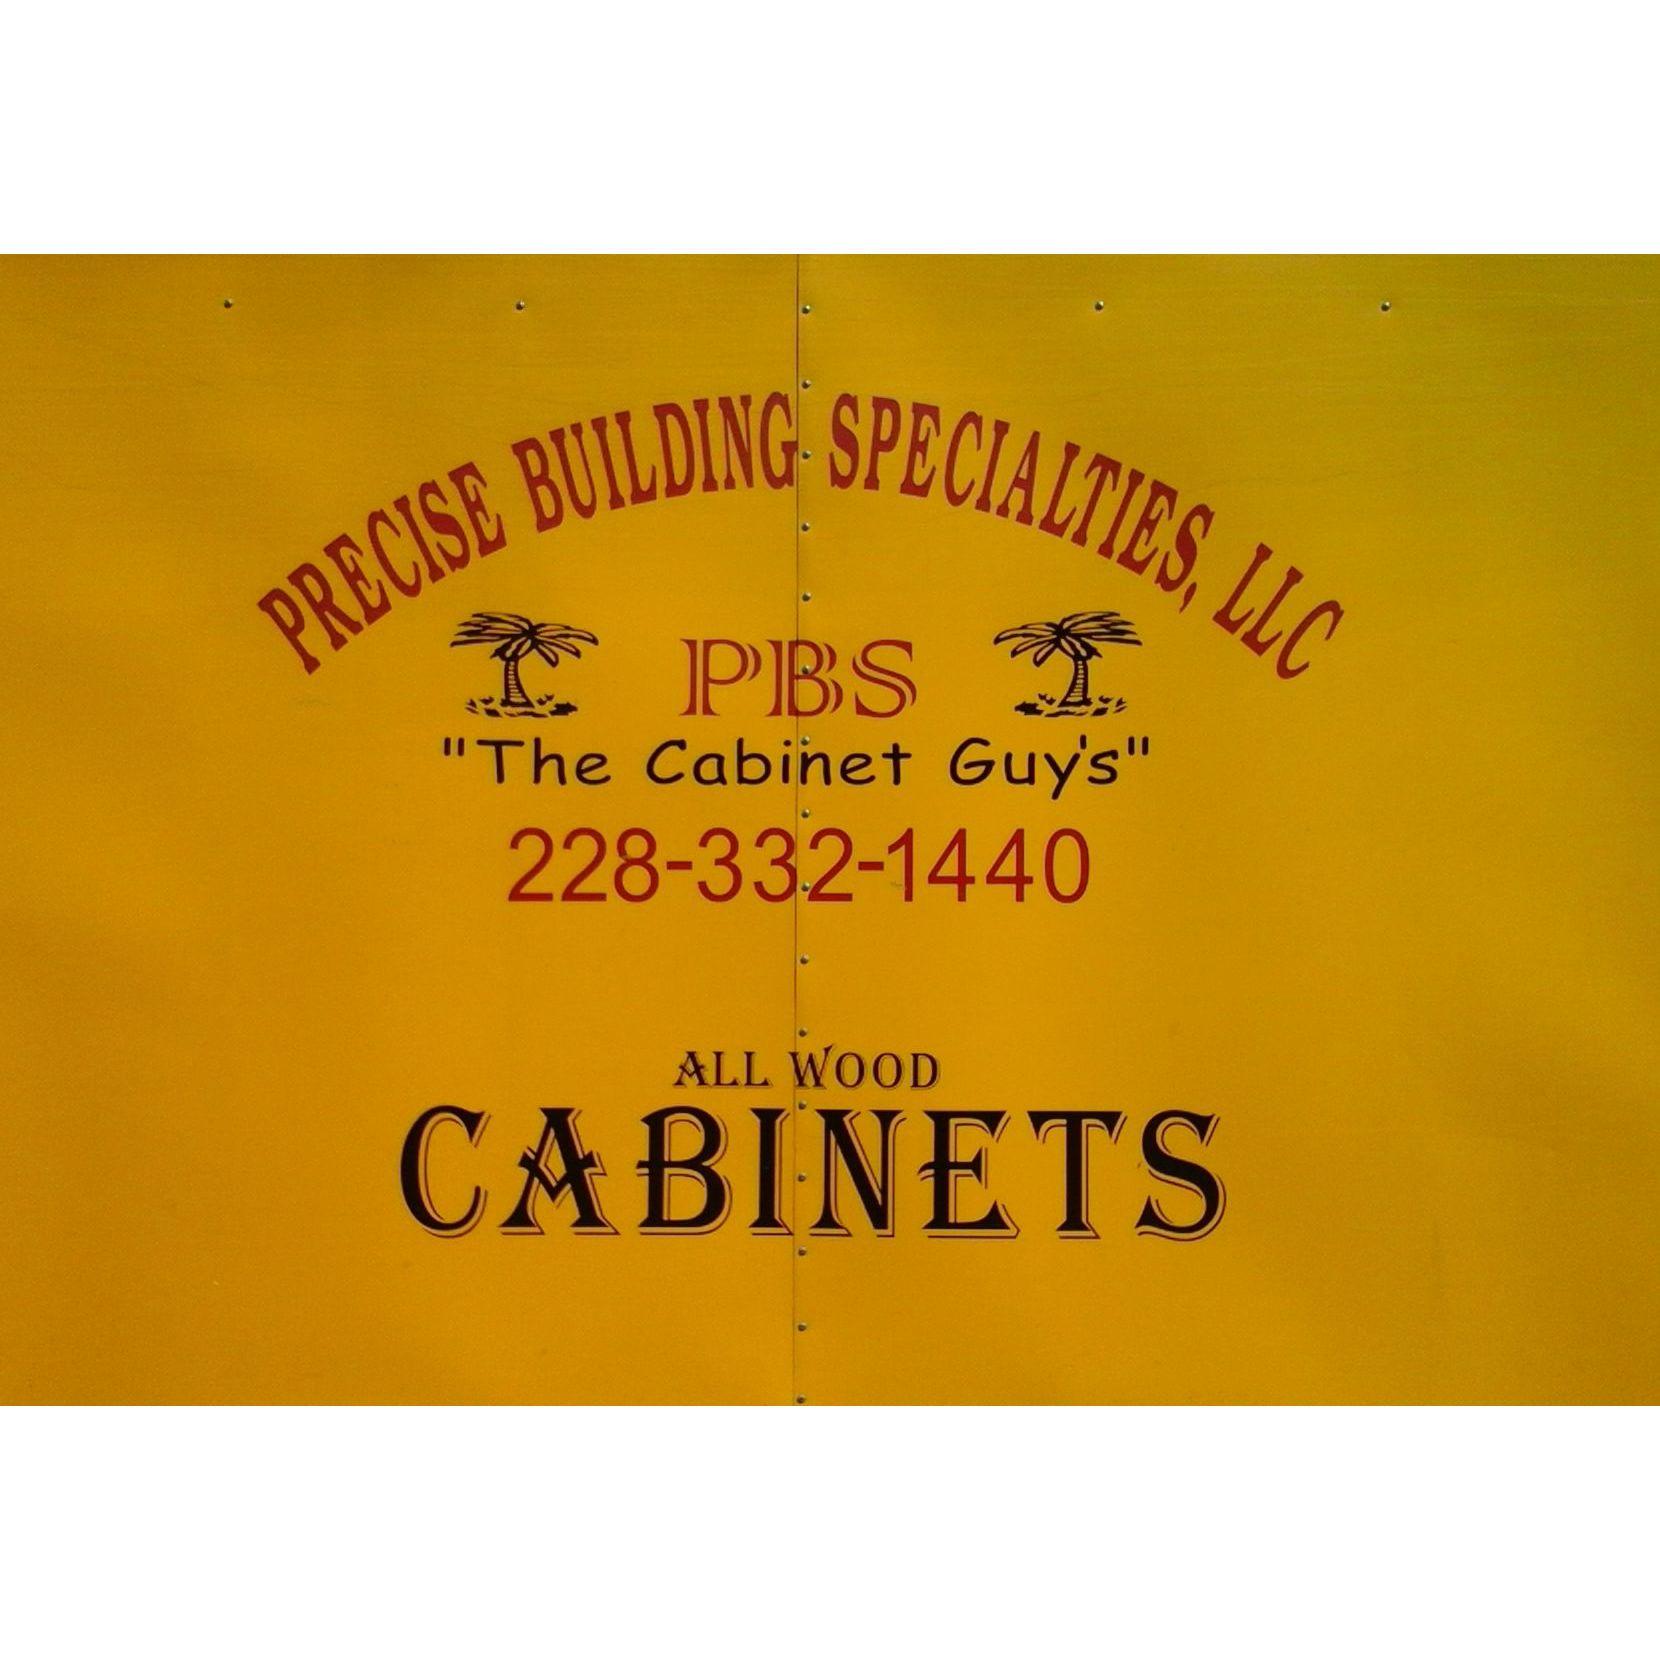 Precise Building Specialities